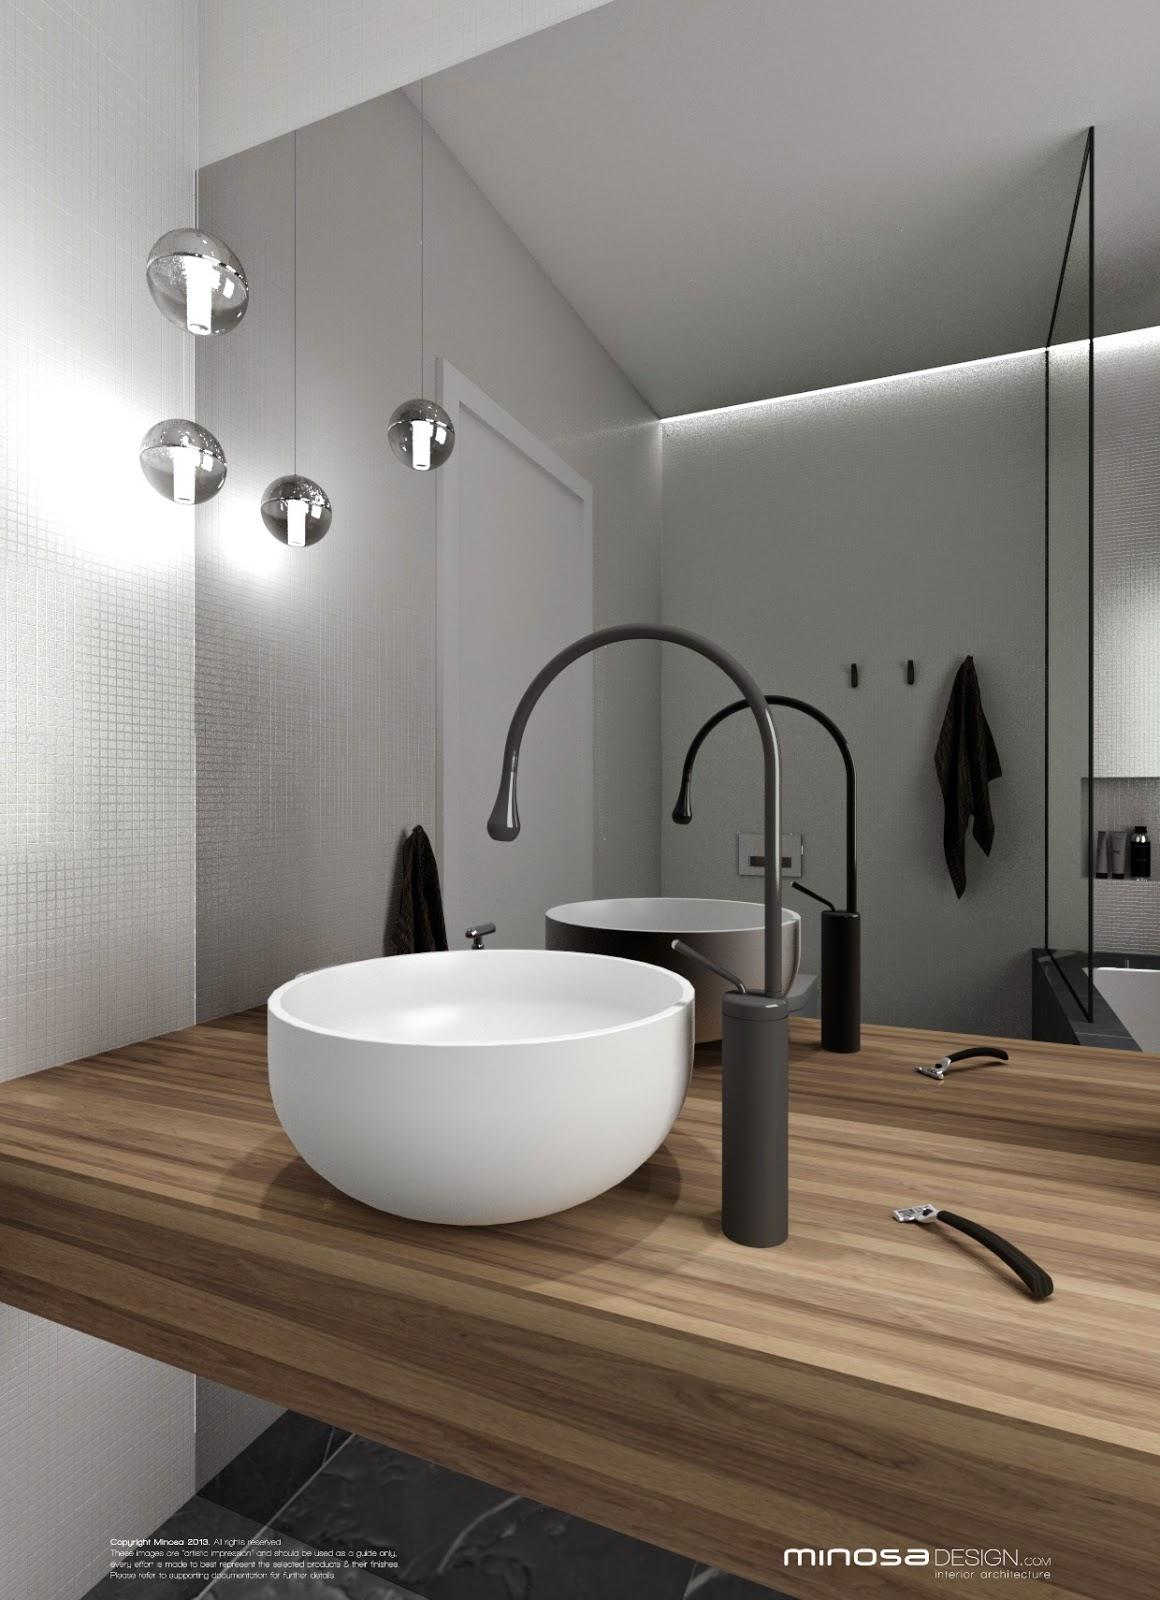 Minosa bathroom design small space feels large for Bathroom room design